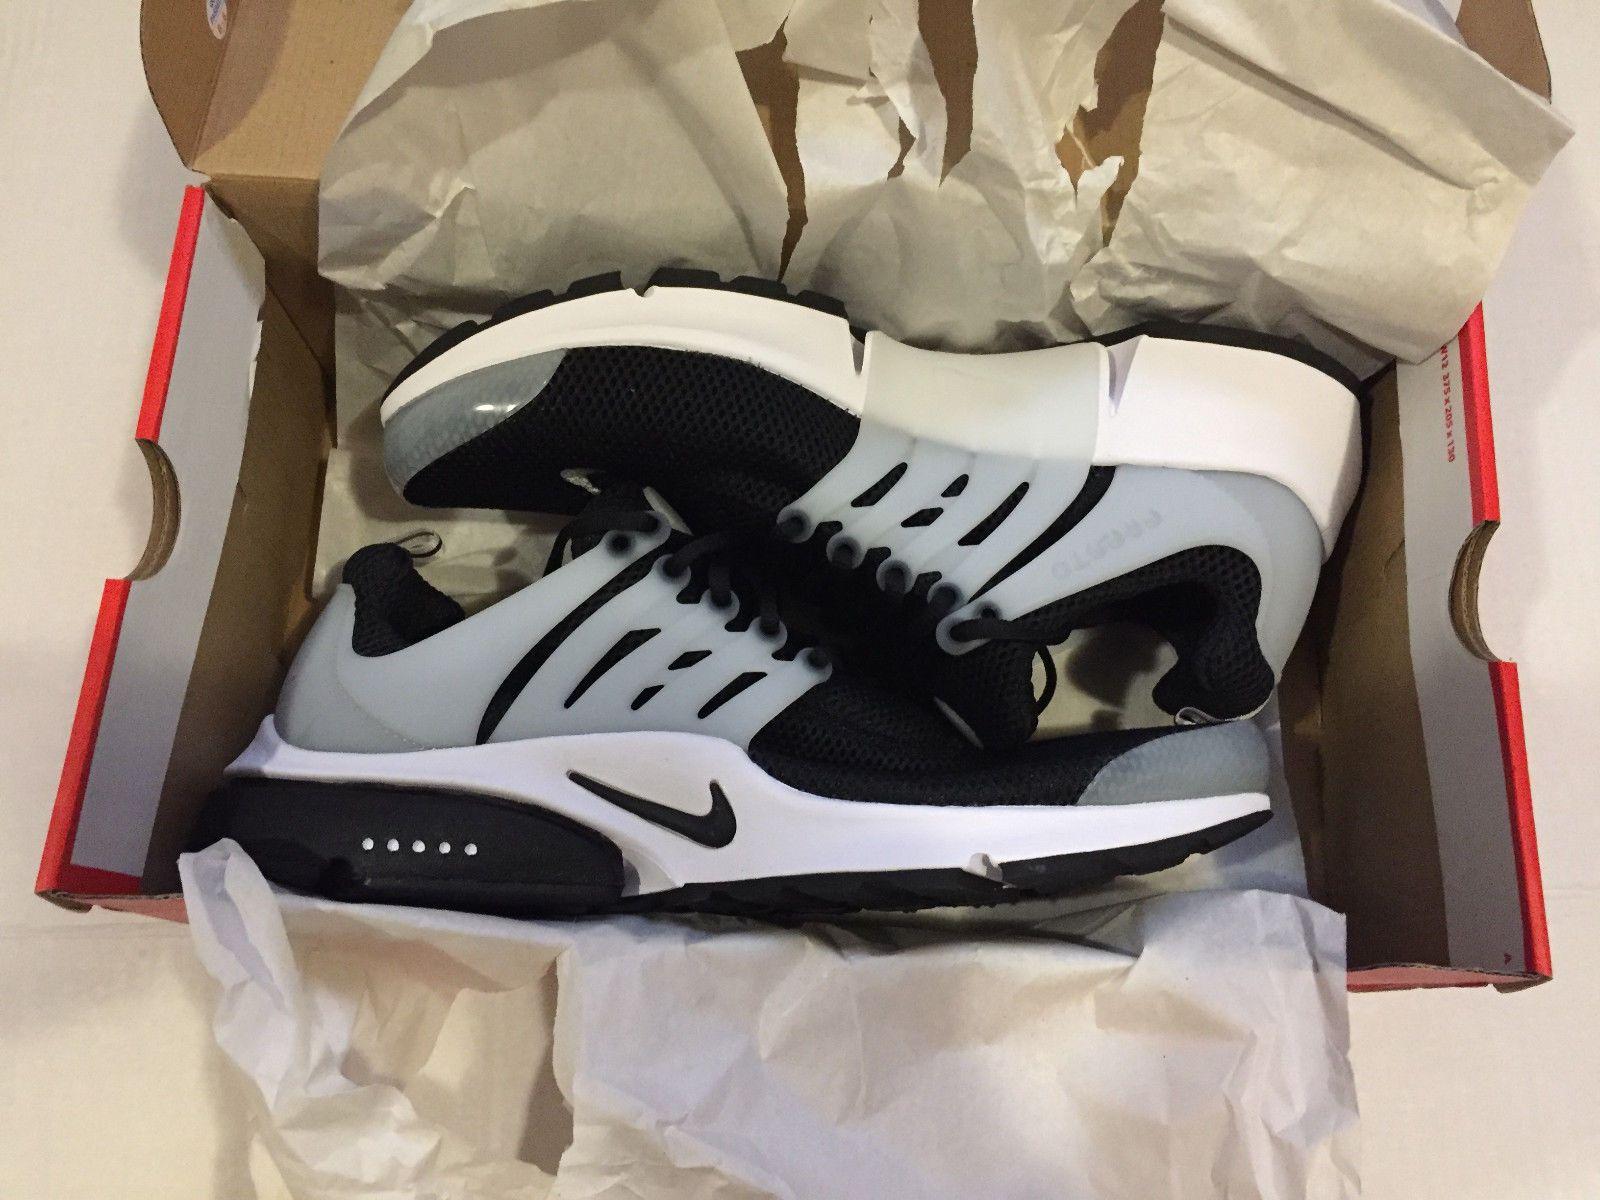 pretty nice 5240a c76a3 Nike Air Presto - Black Black-White-Neutral Grey Size 13 - New - 848132 010    Men s Shoes   Pinterest   Nike air presto black, Shoes and Nike air